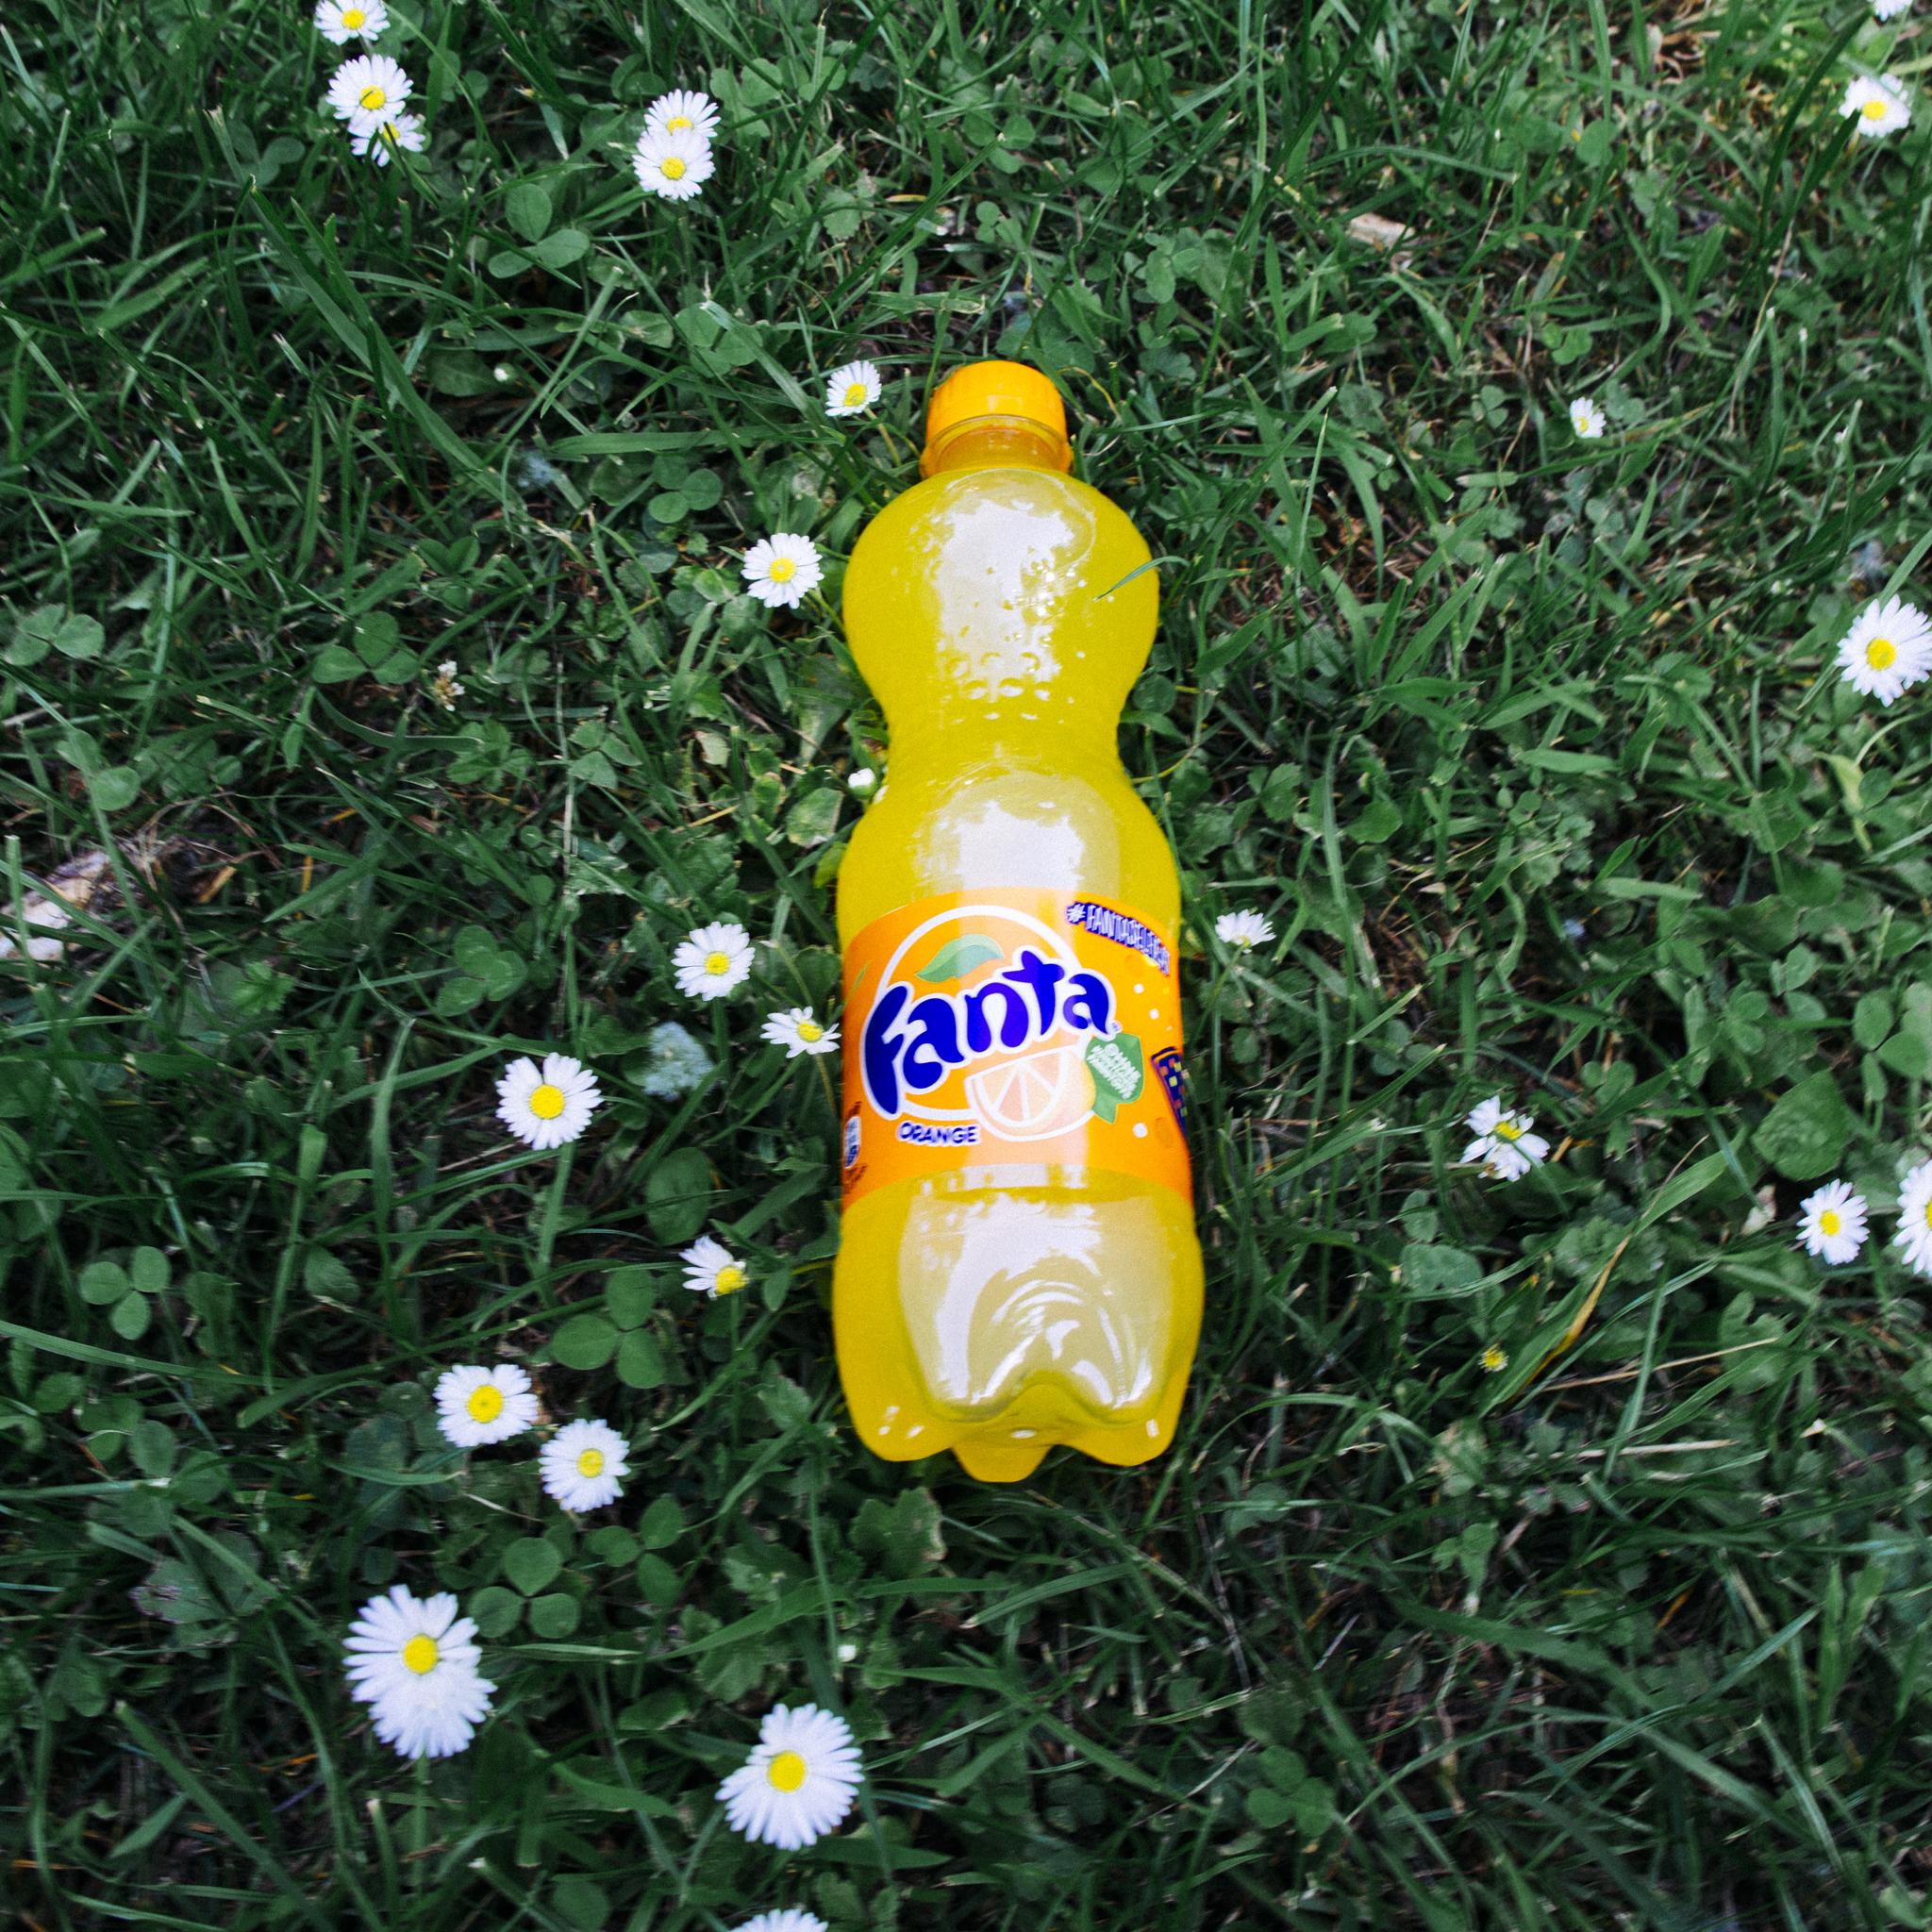 SE_Vice_CocaCola_0002.jpg